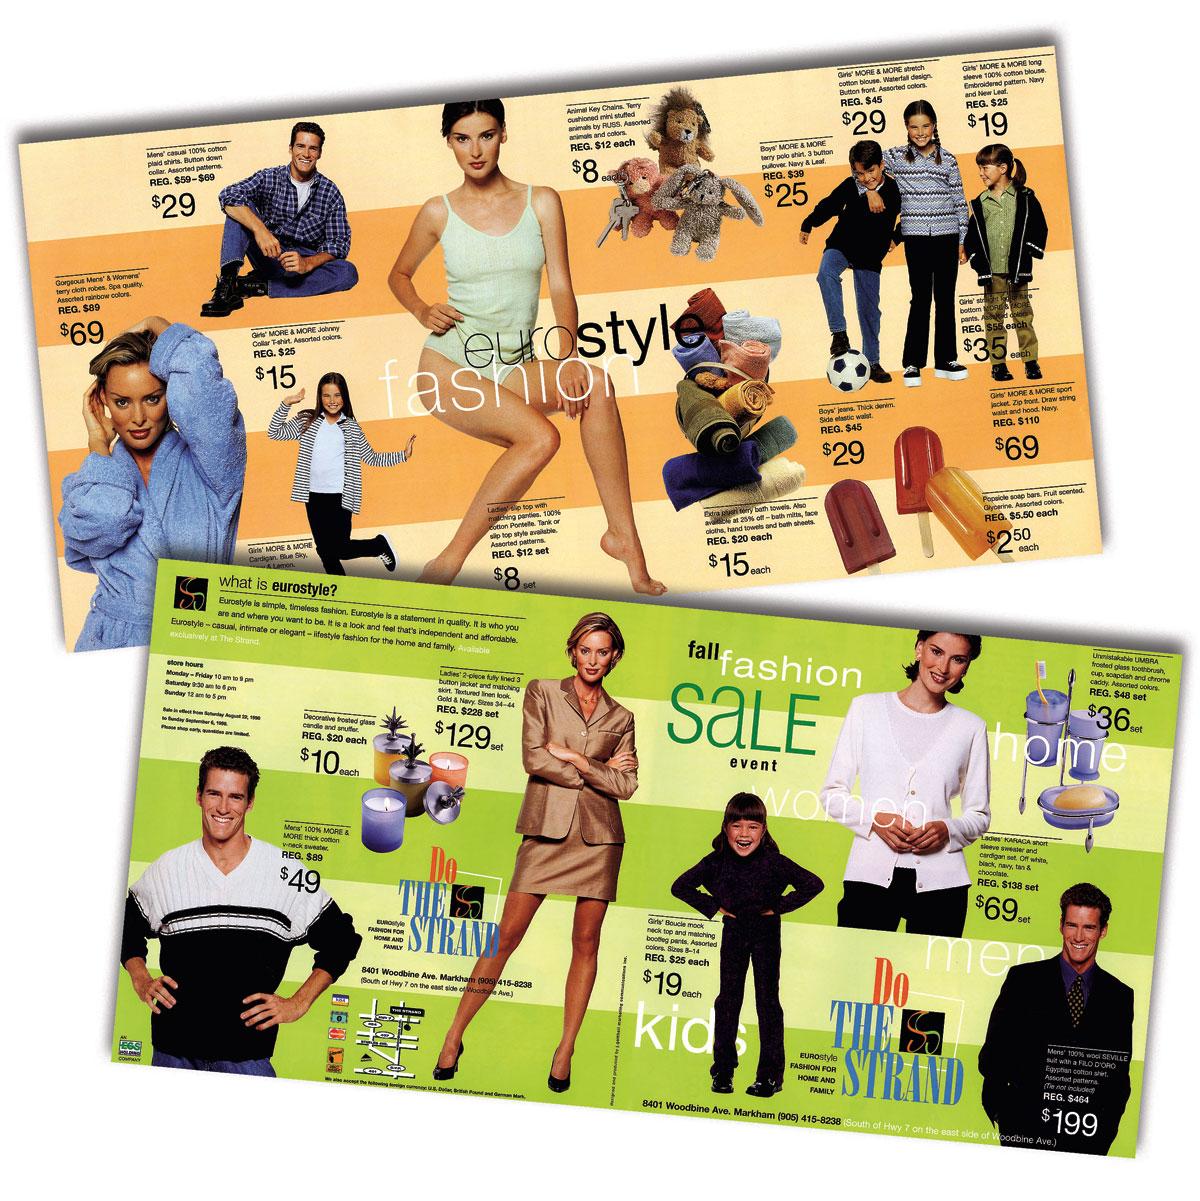 The Strand brochure